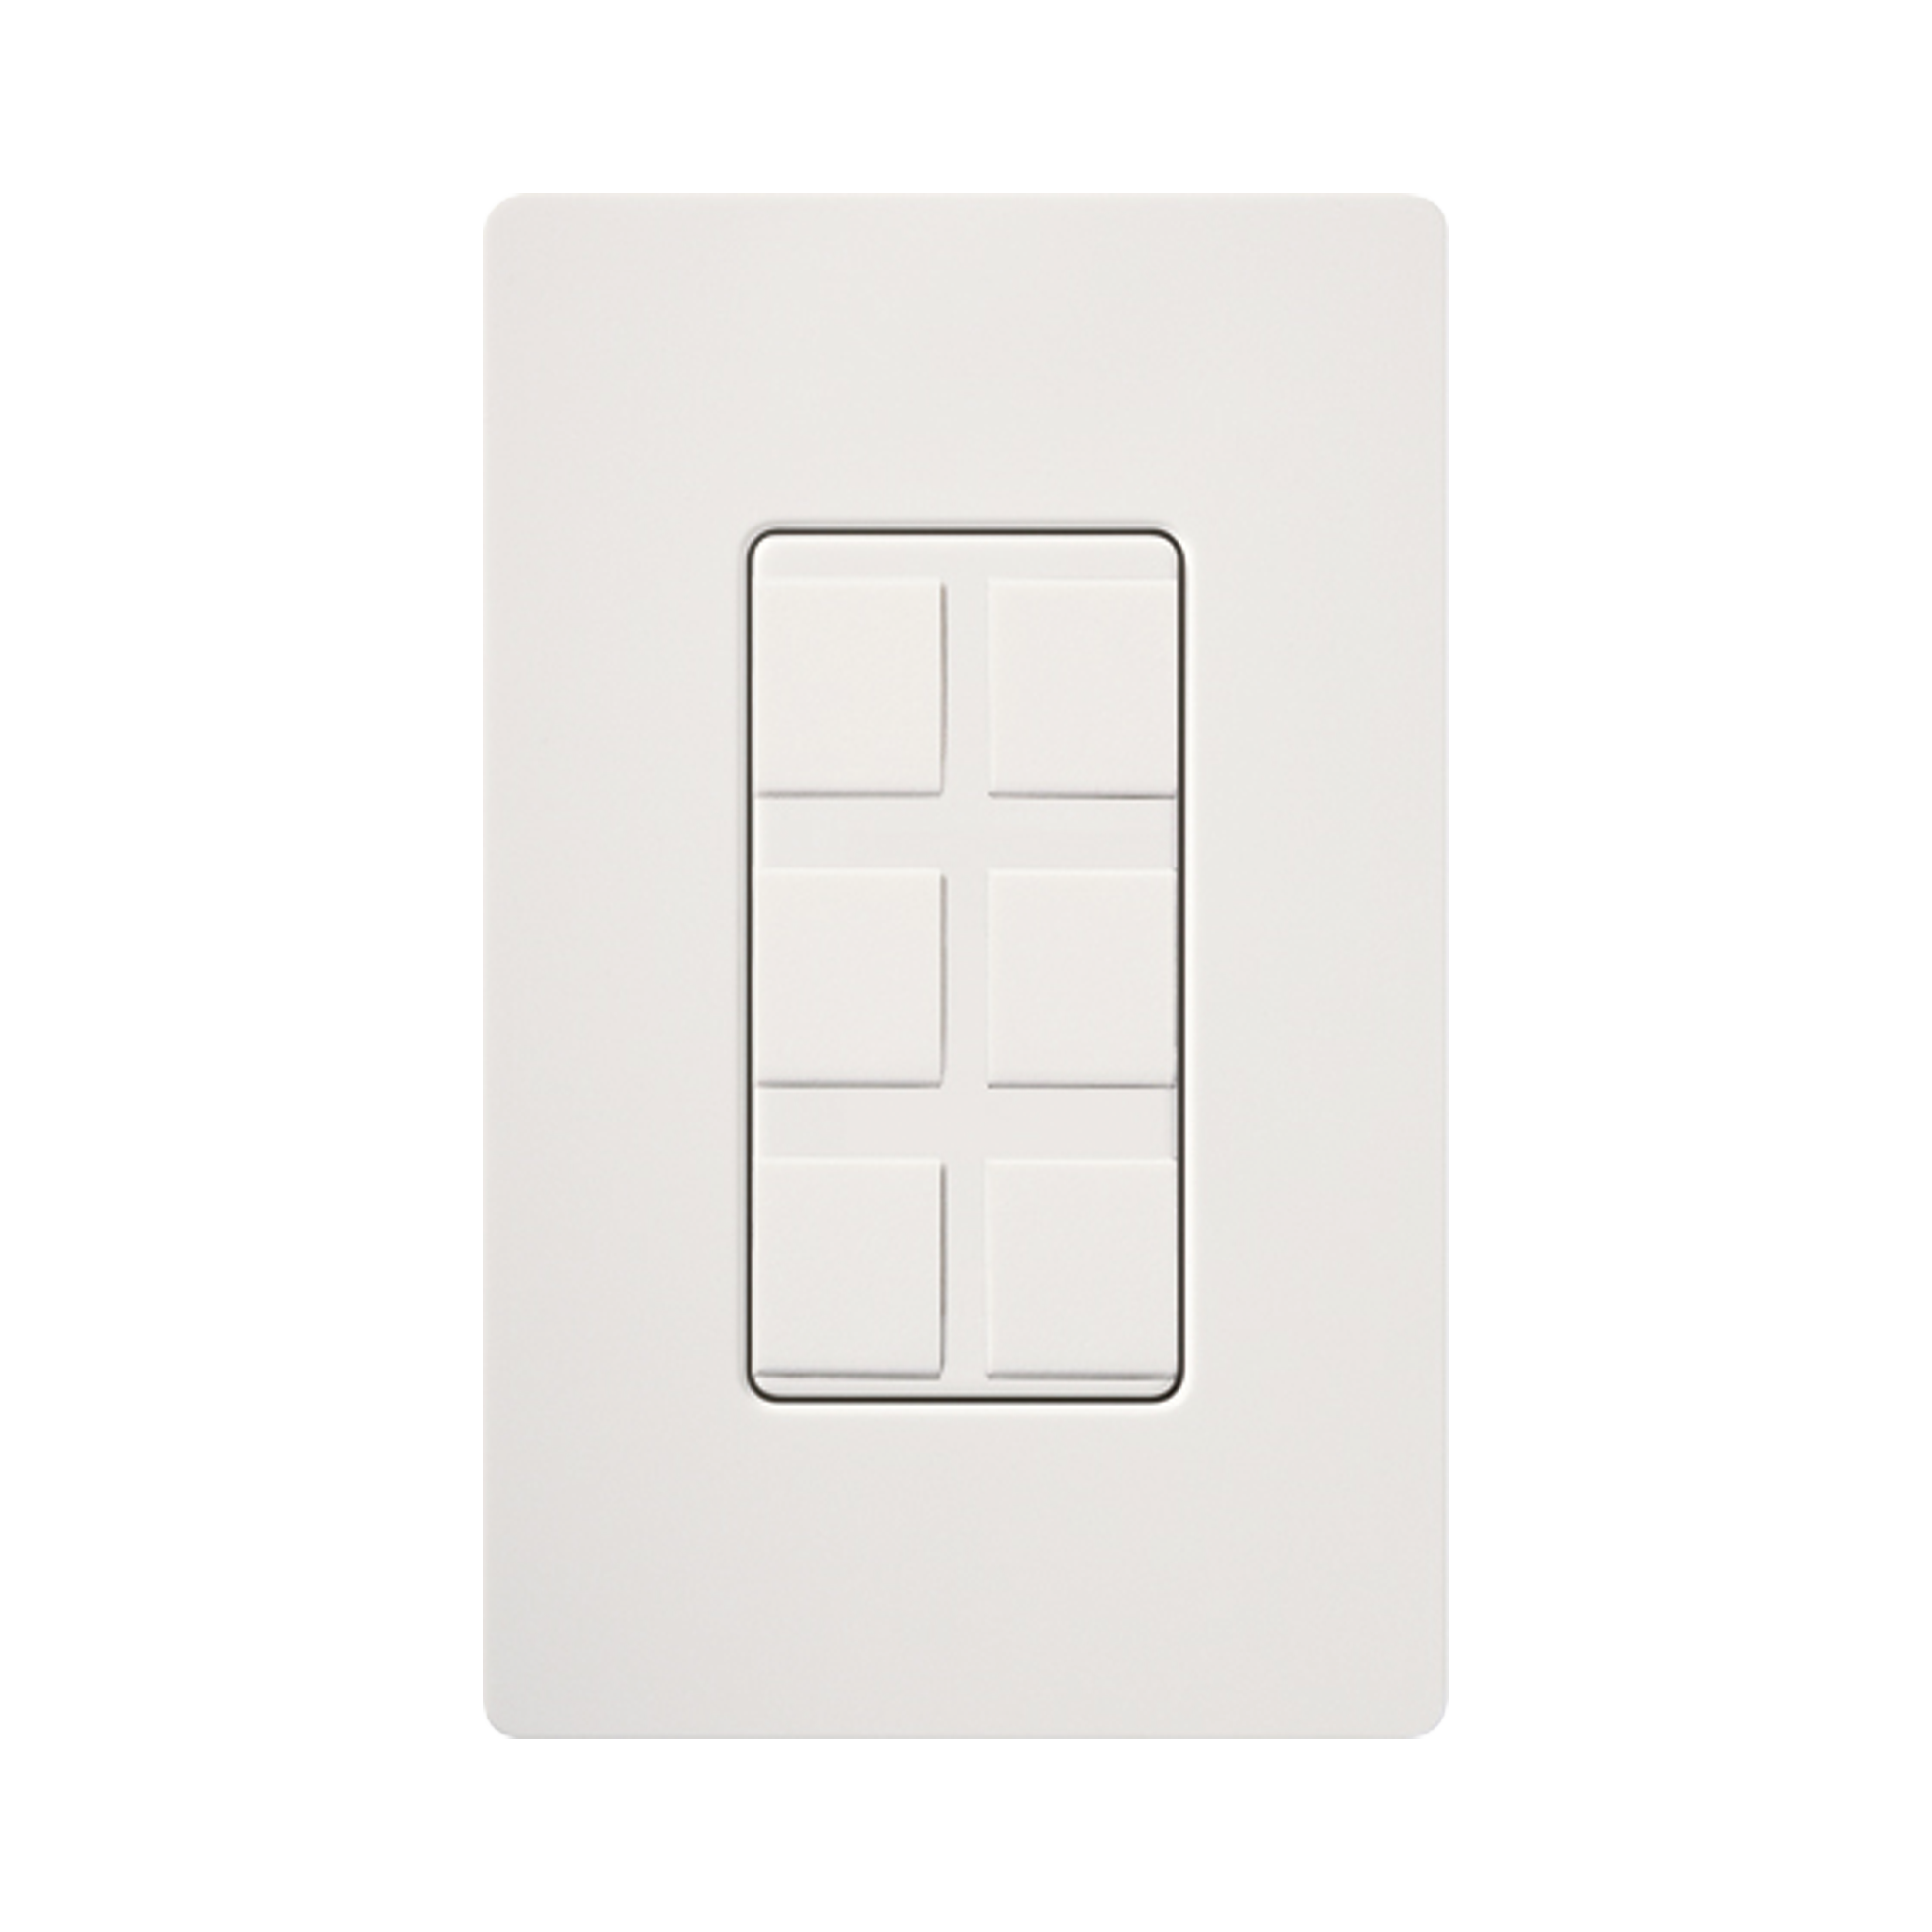 Caja de pared para contactos varios, 6 mini espacios.